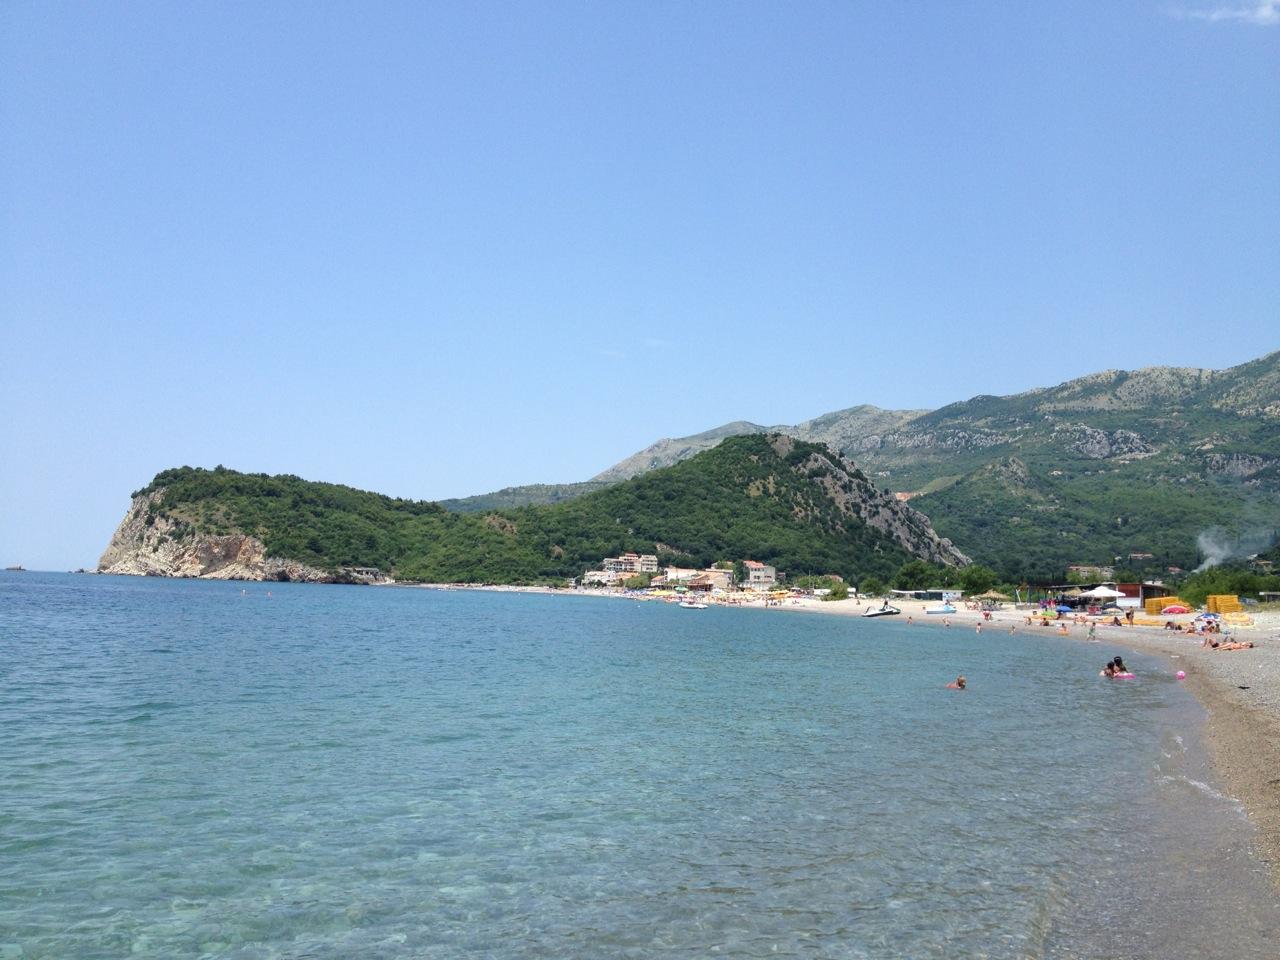 Montenegro beaches